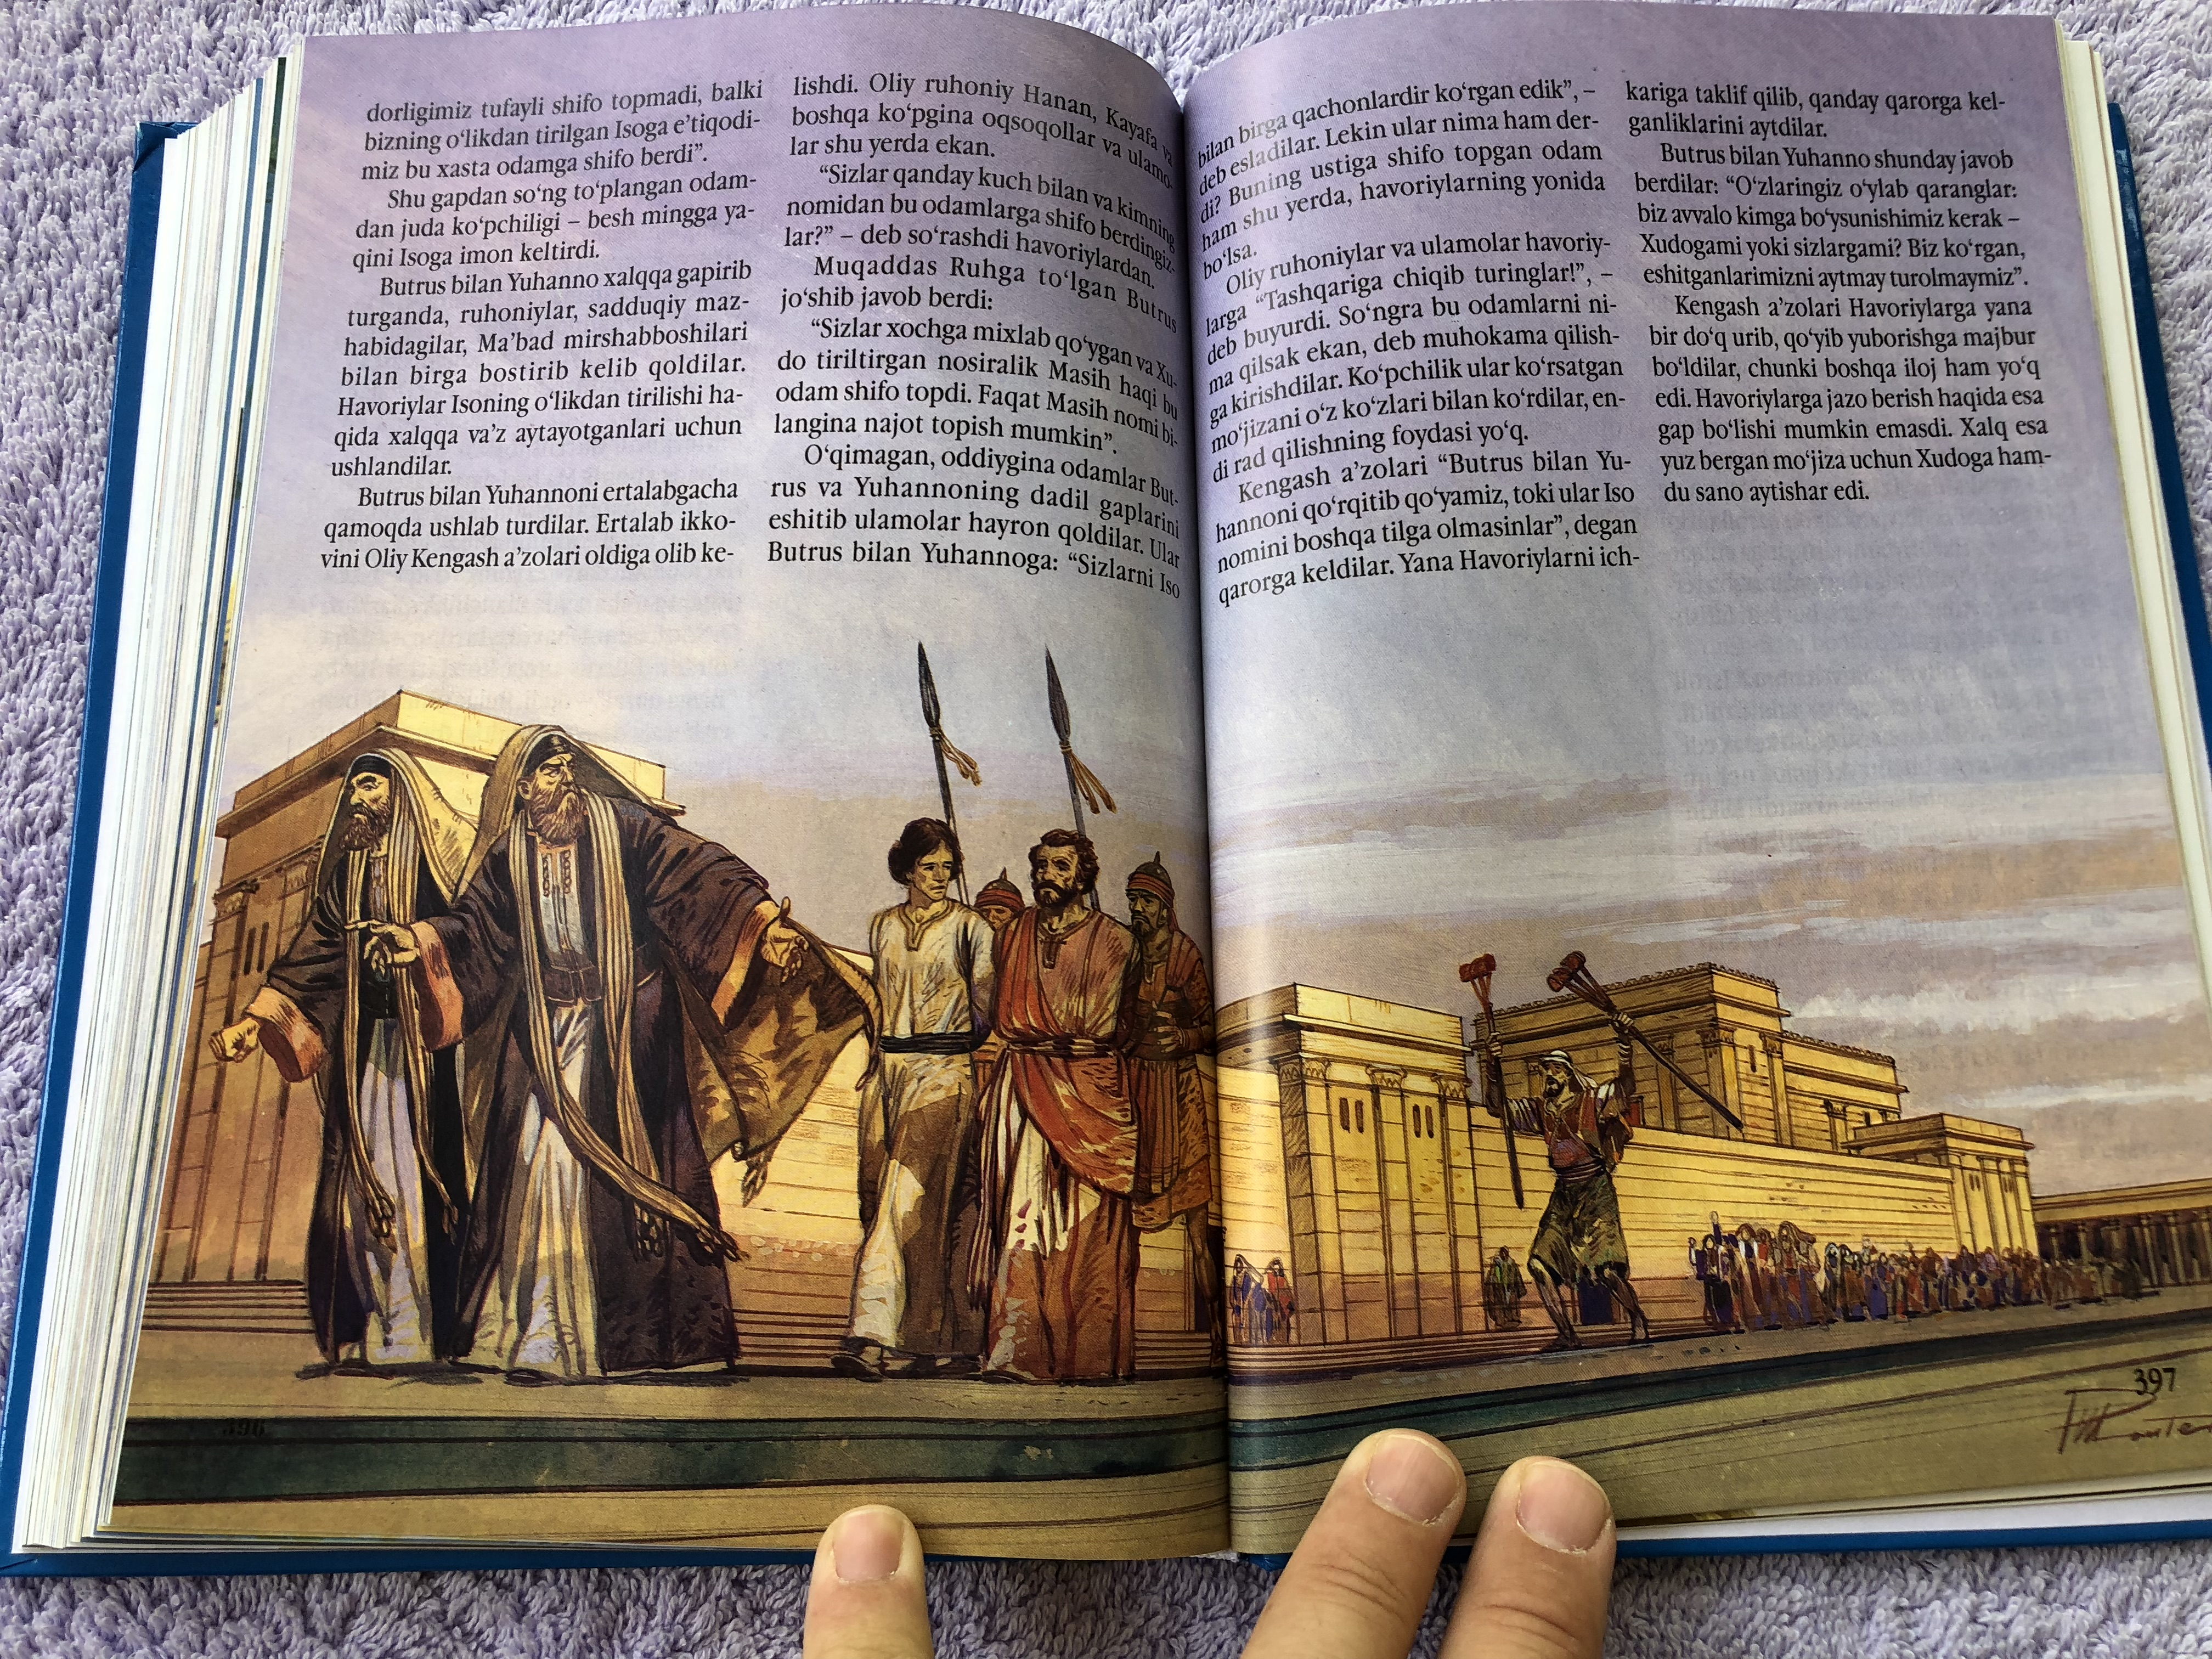 uzbek-children-s-bible-muqaddas-kitob-16-.jpg